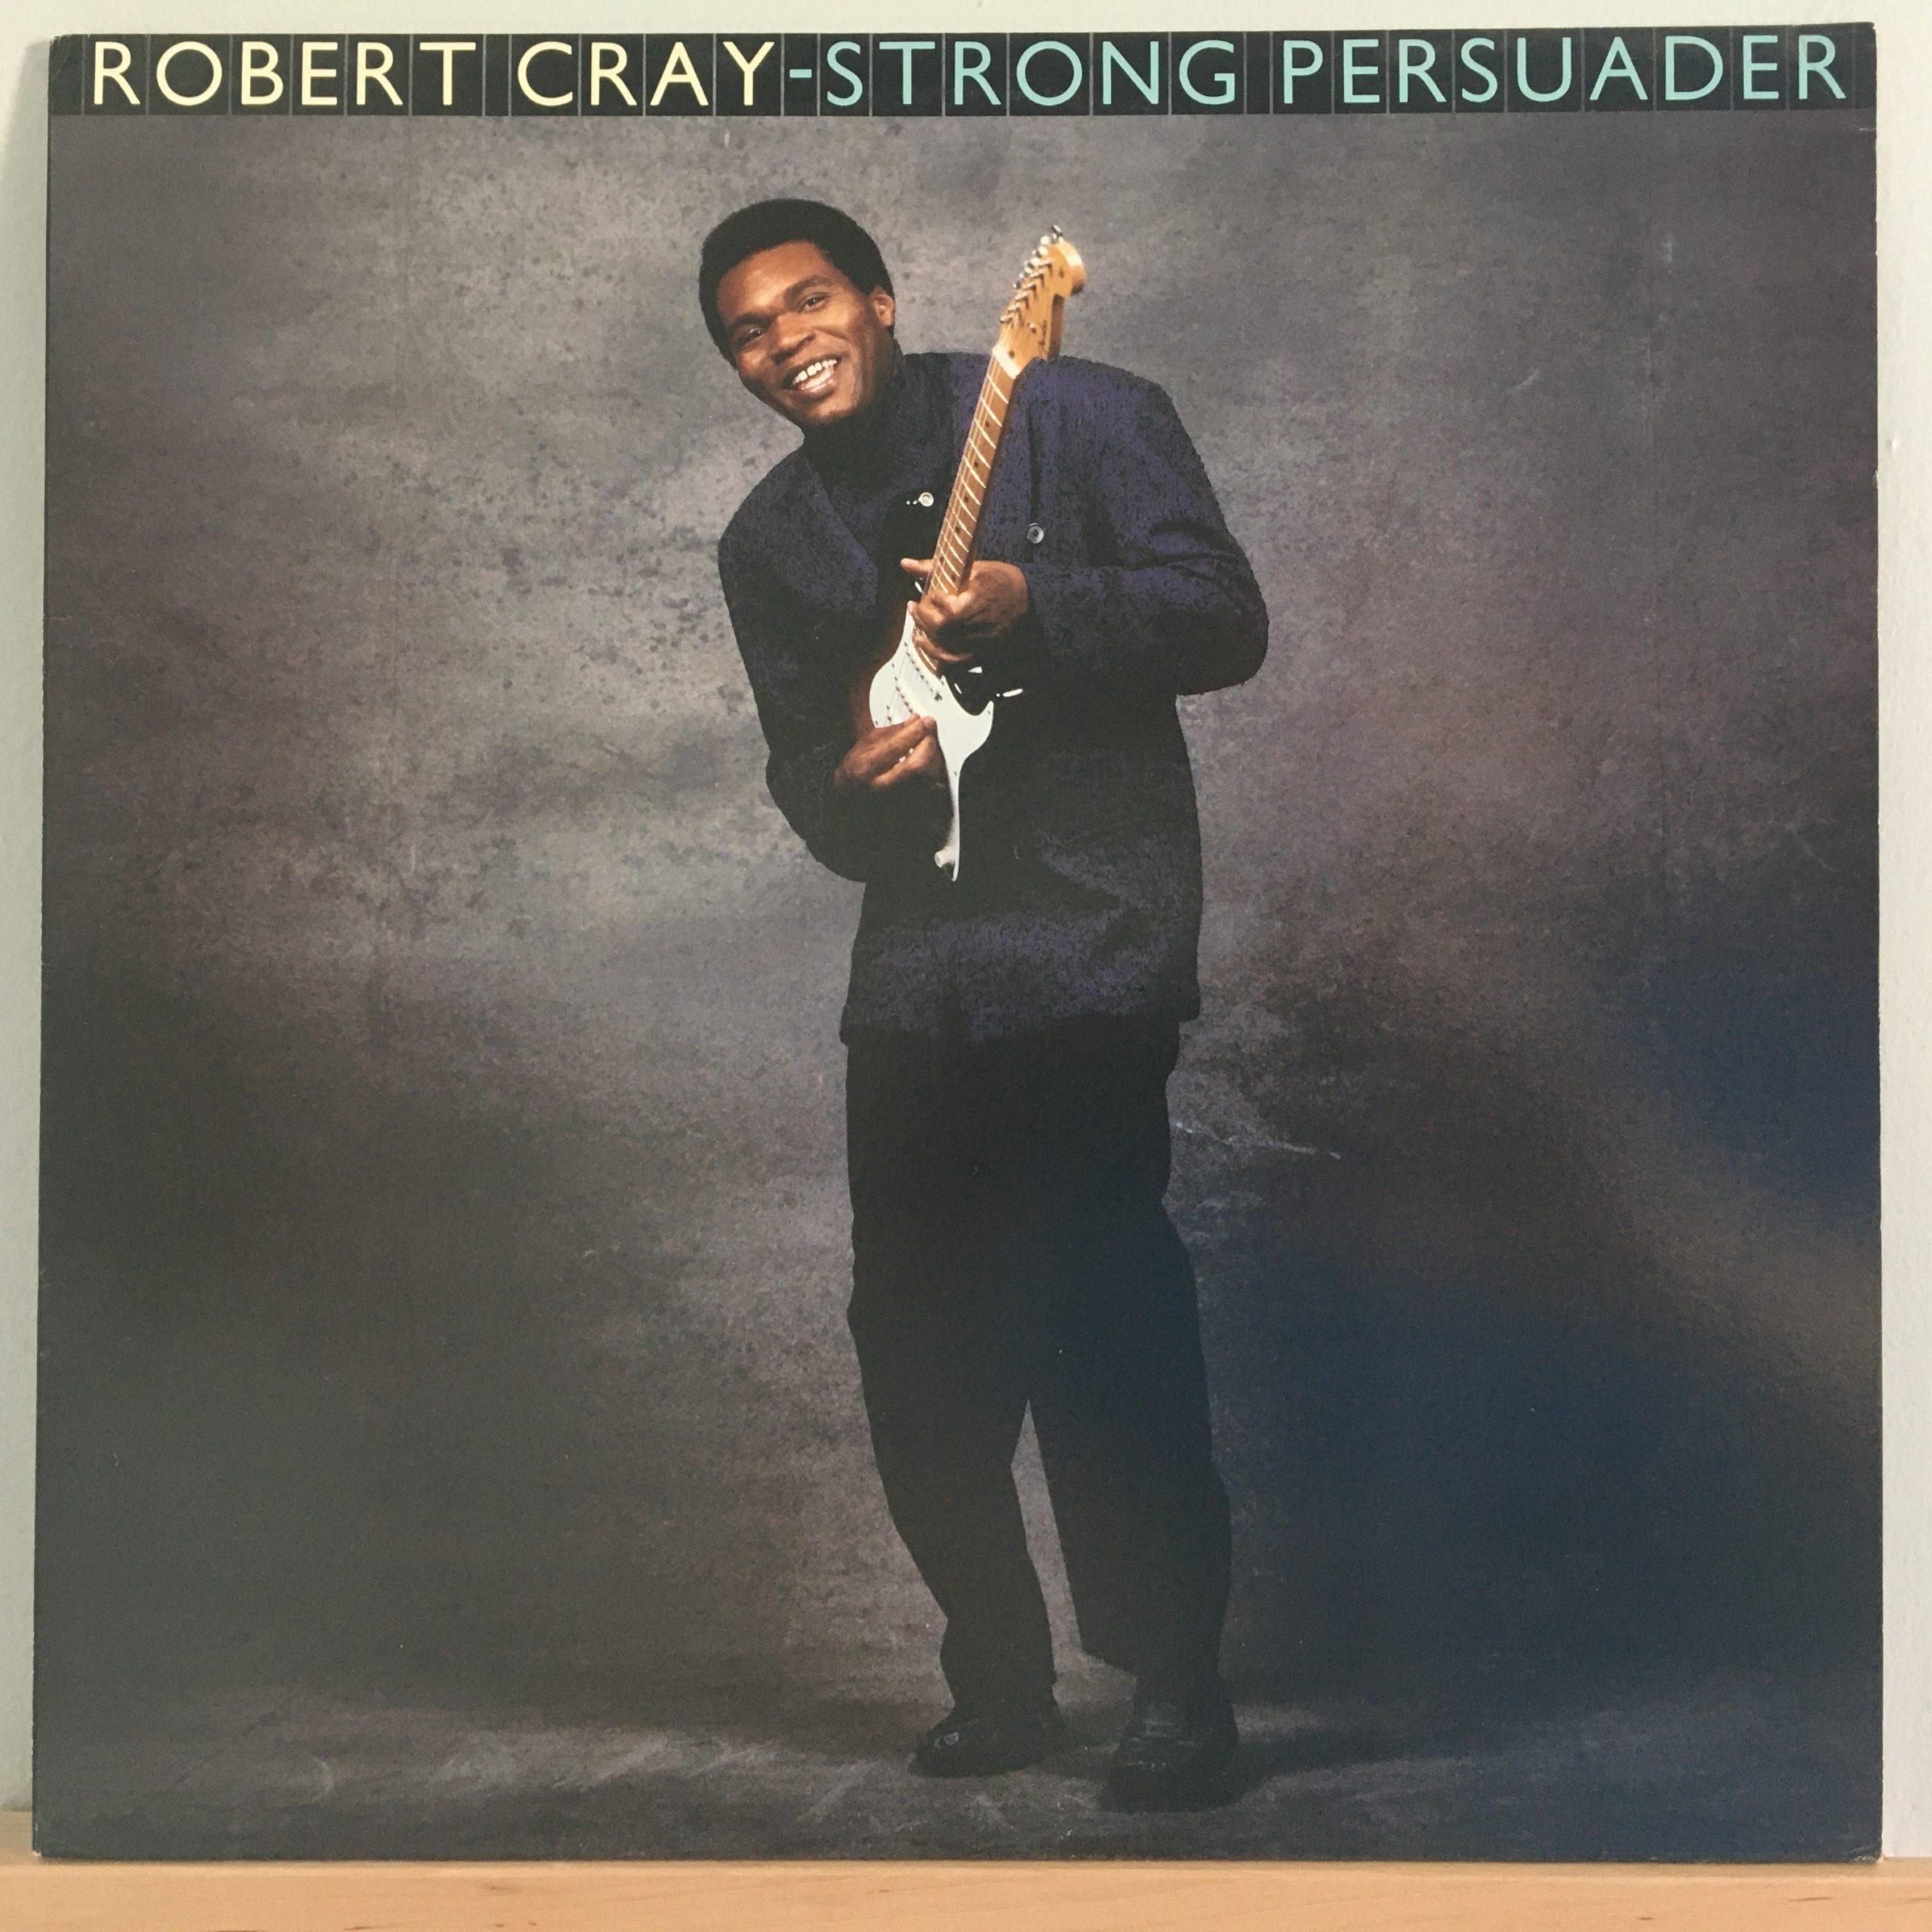 Robert Cray –Strong Persuader